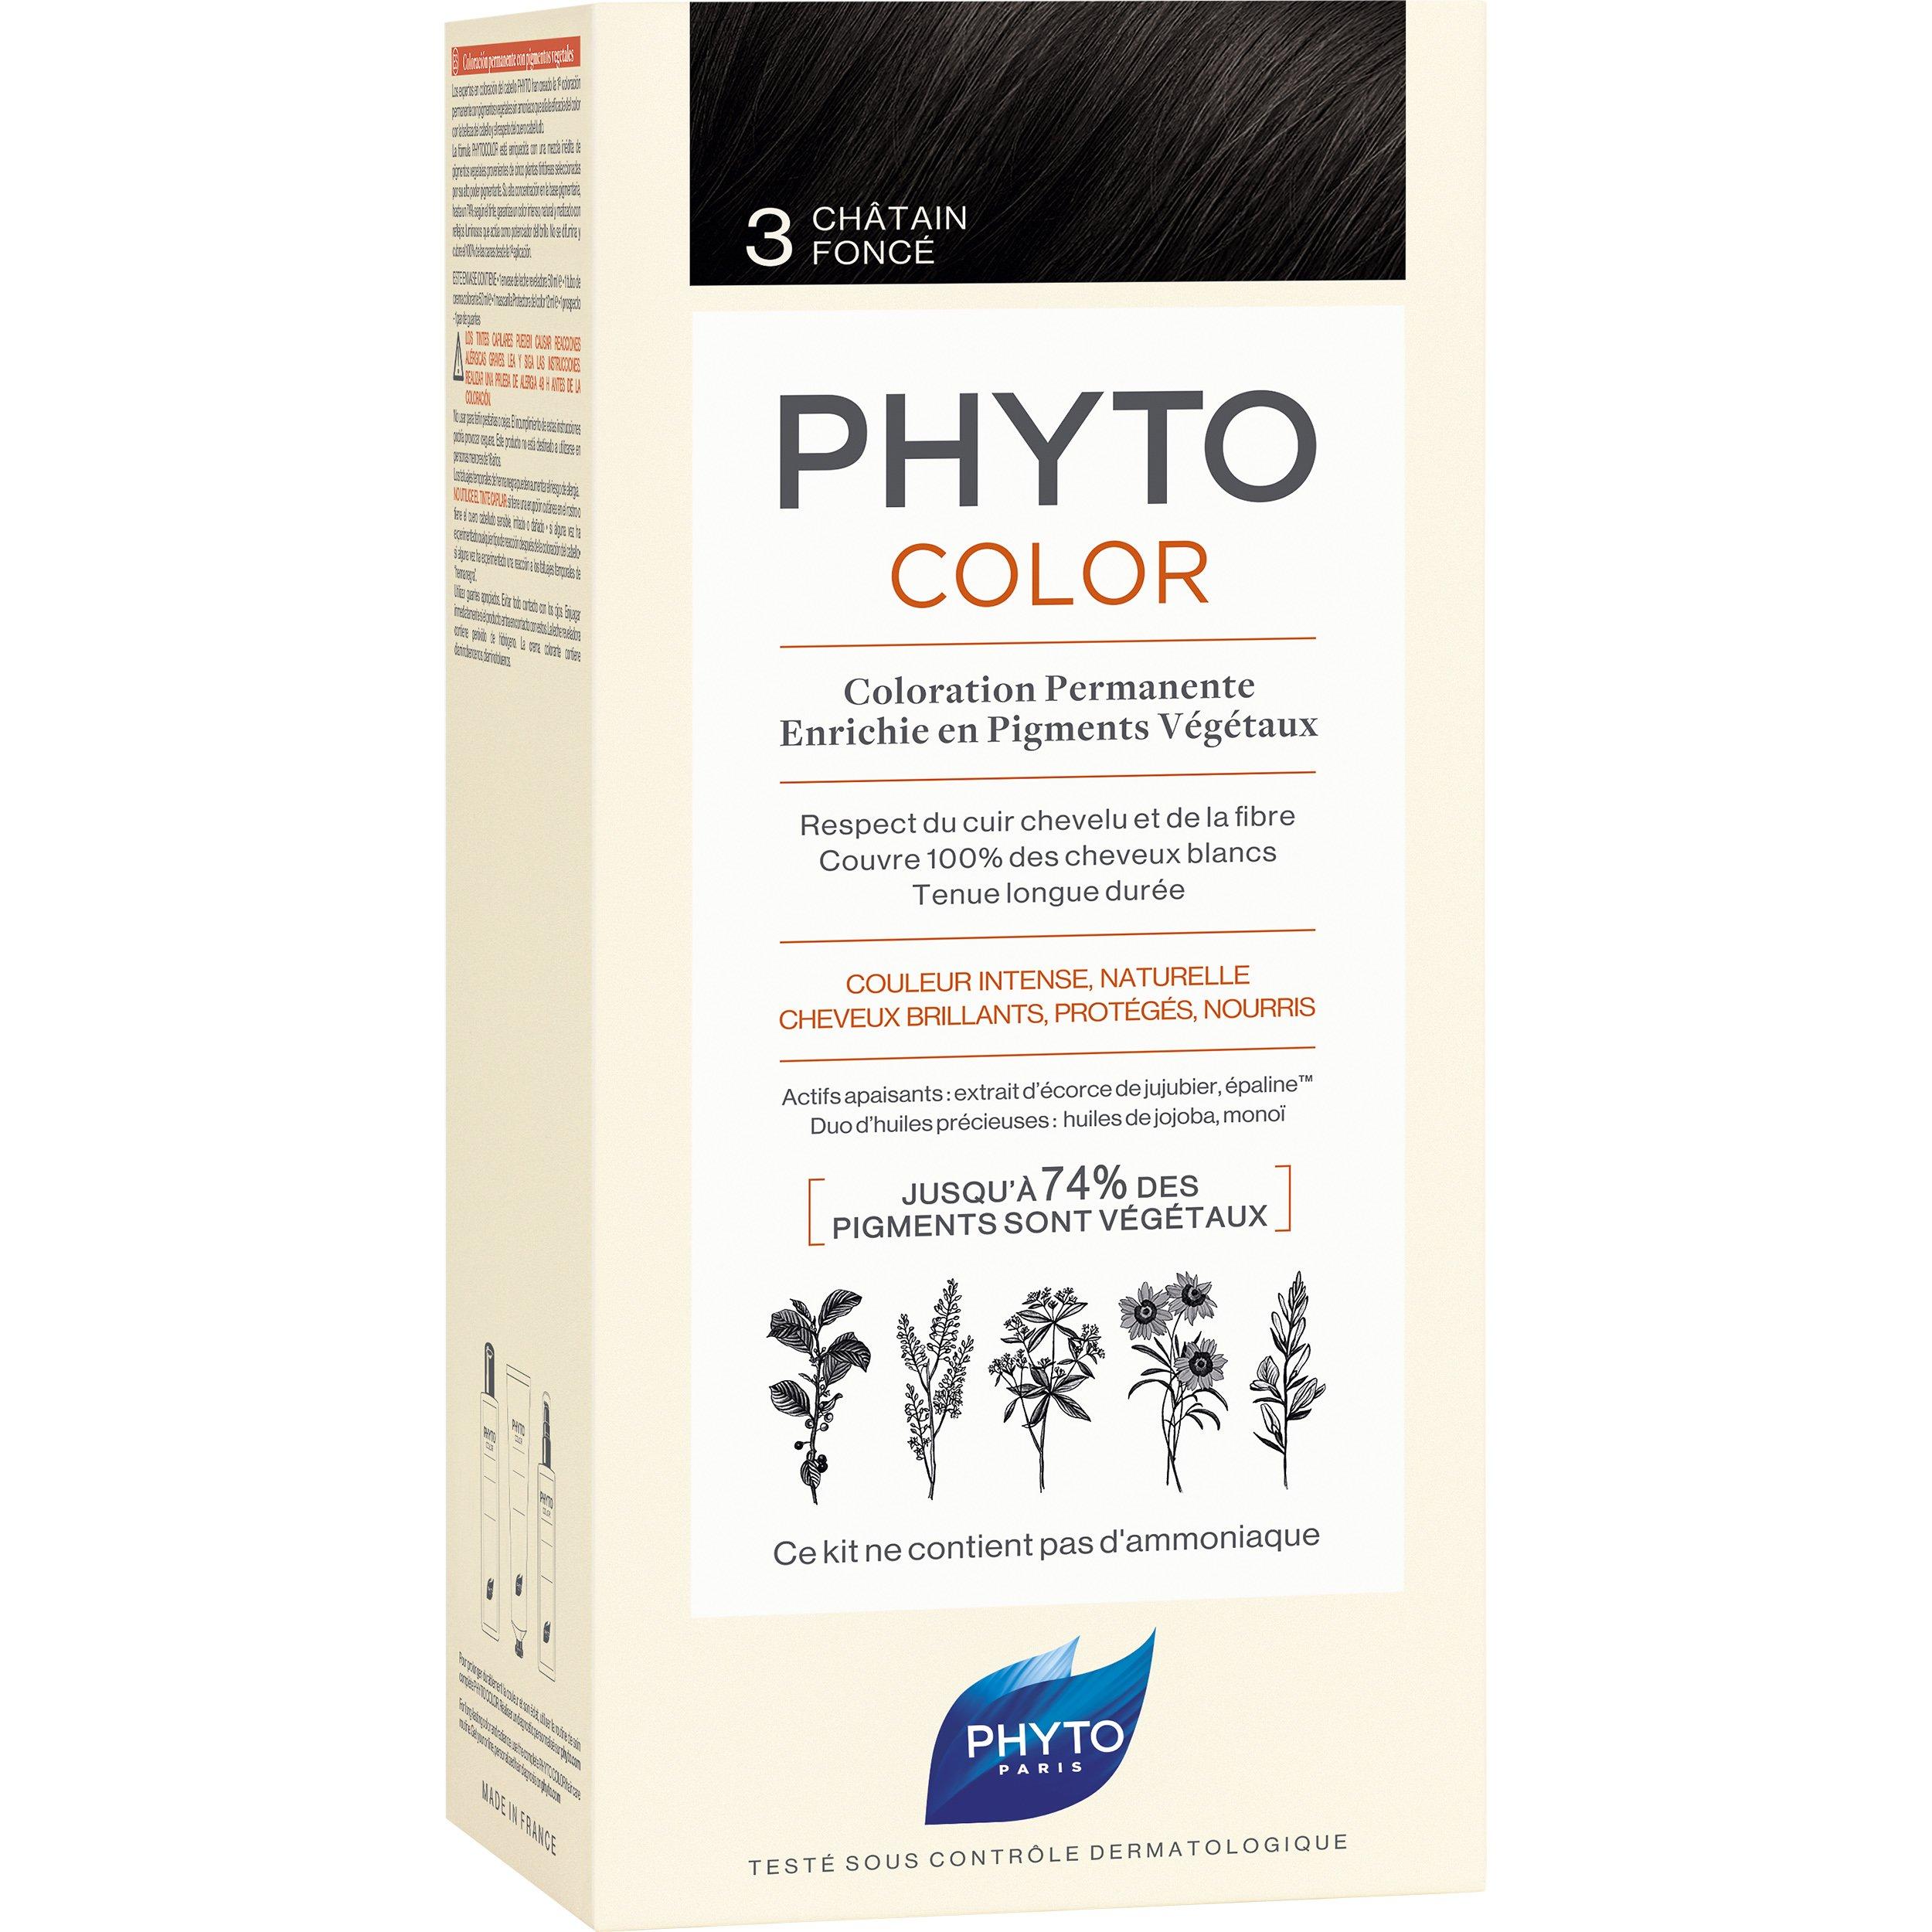 Phyto PhytoColor Coloration Permanente η No1 Μόνιμη Βαφή Μαλλιών Χωρίς Χρωστικές Ουσίες & Αμμωνία – 3 Καστανό Σκούρο